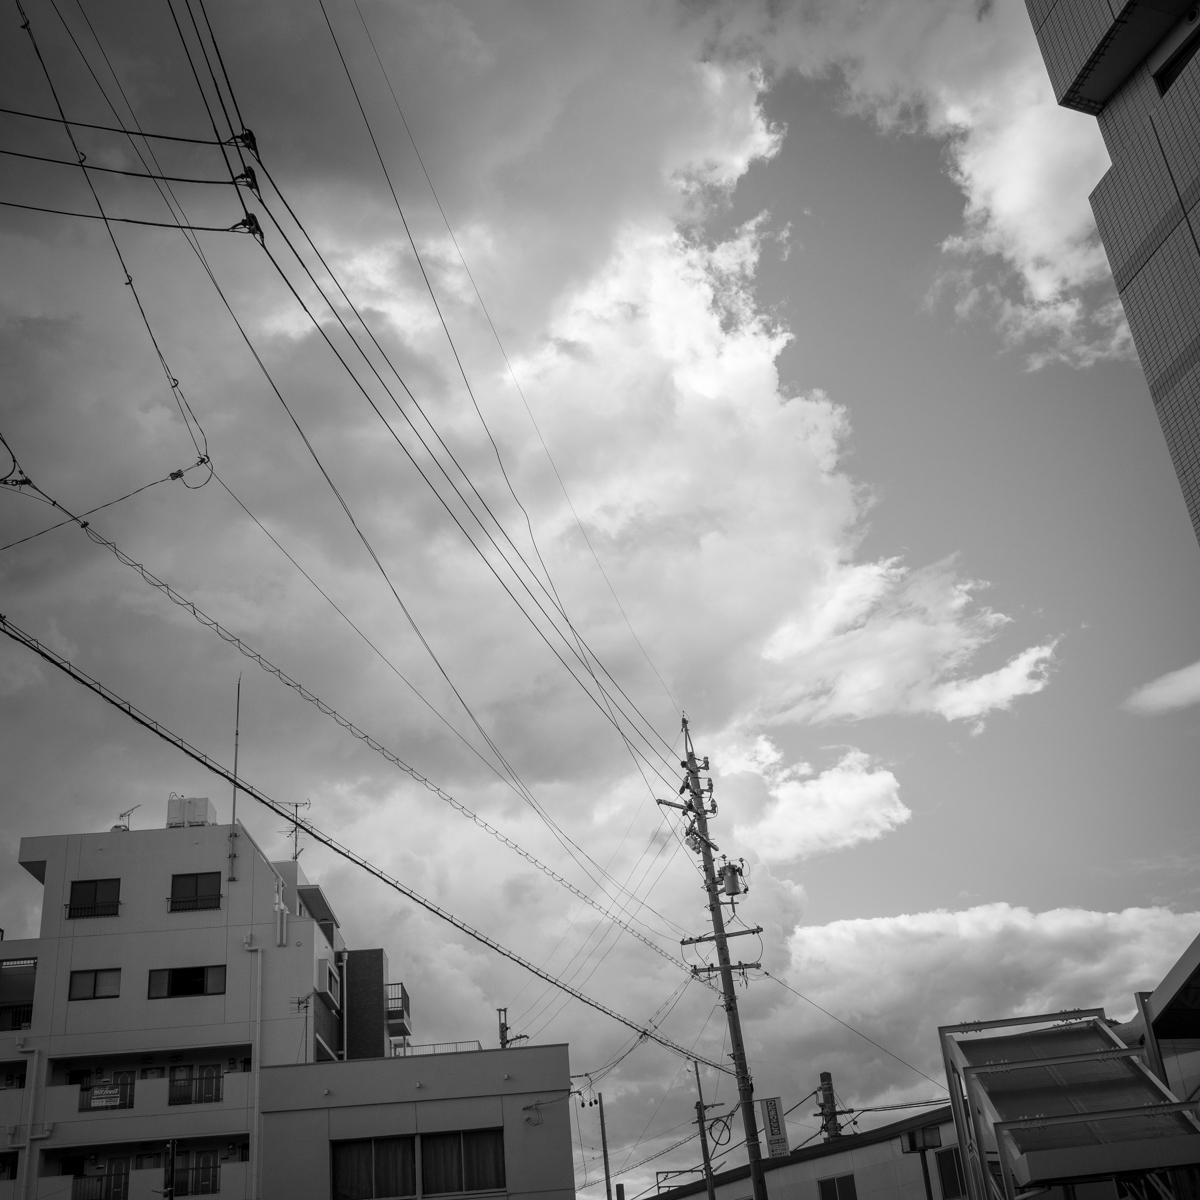 f:id:nagoya-meshi:20190827014549j:plain